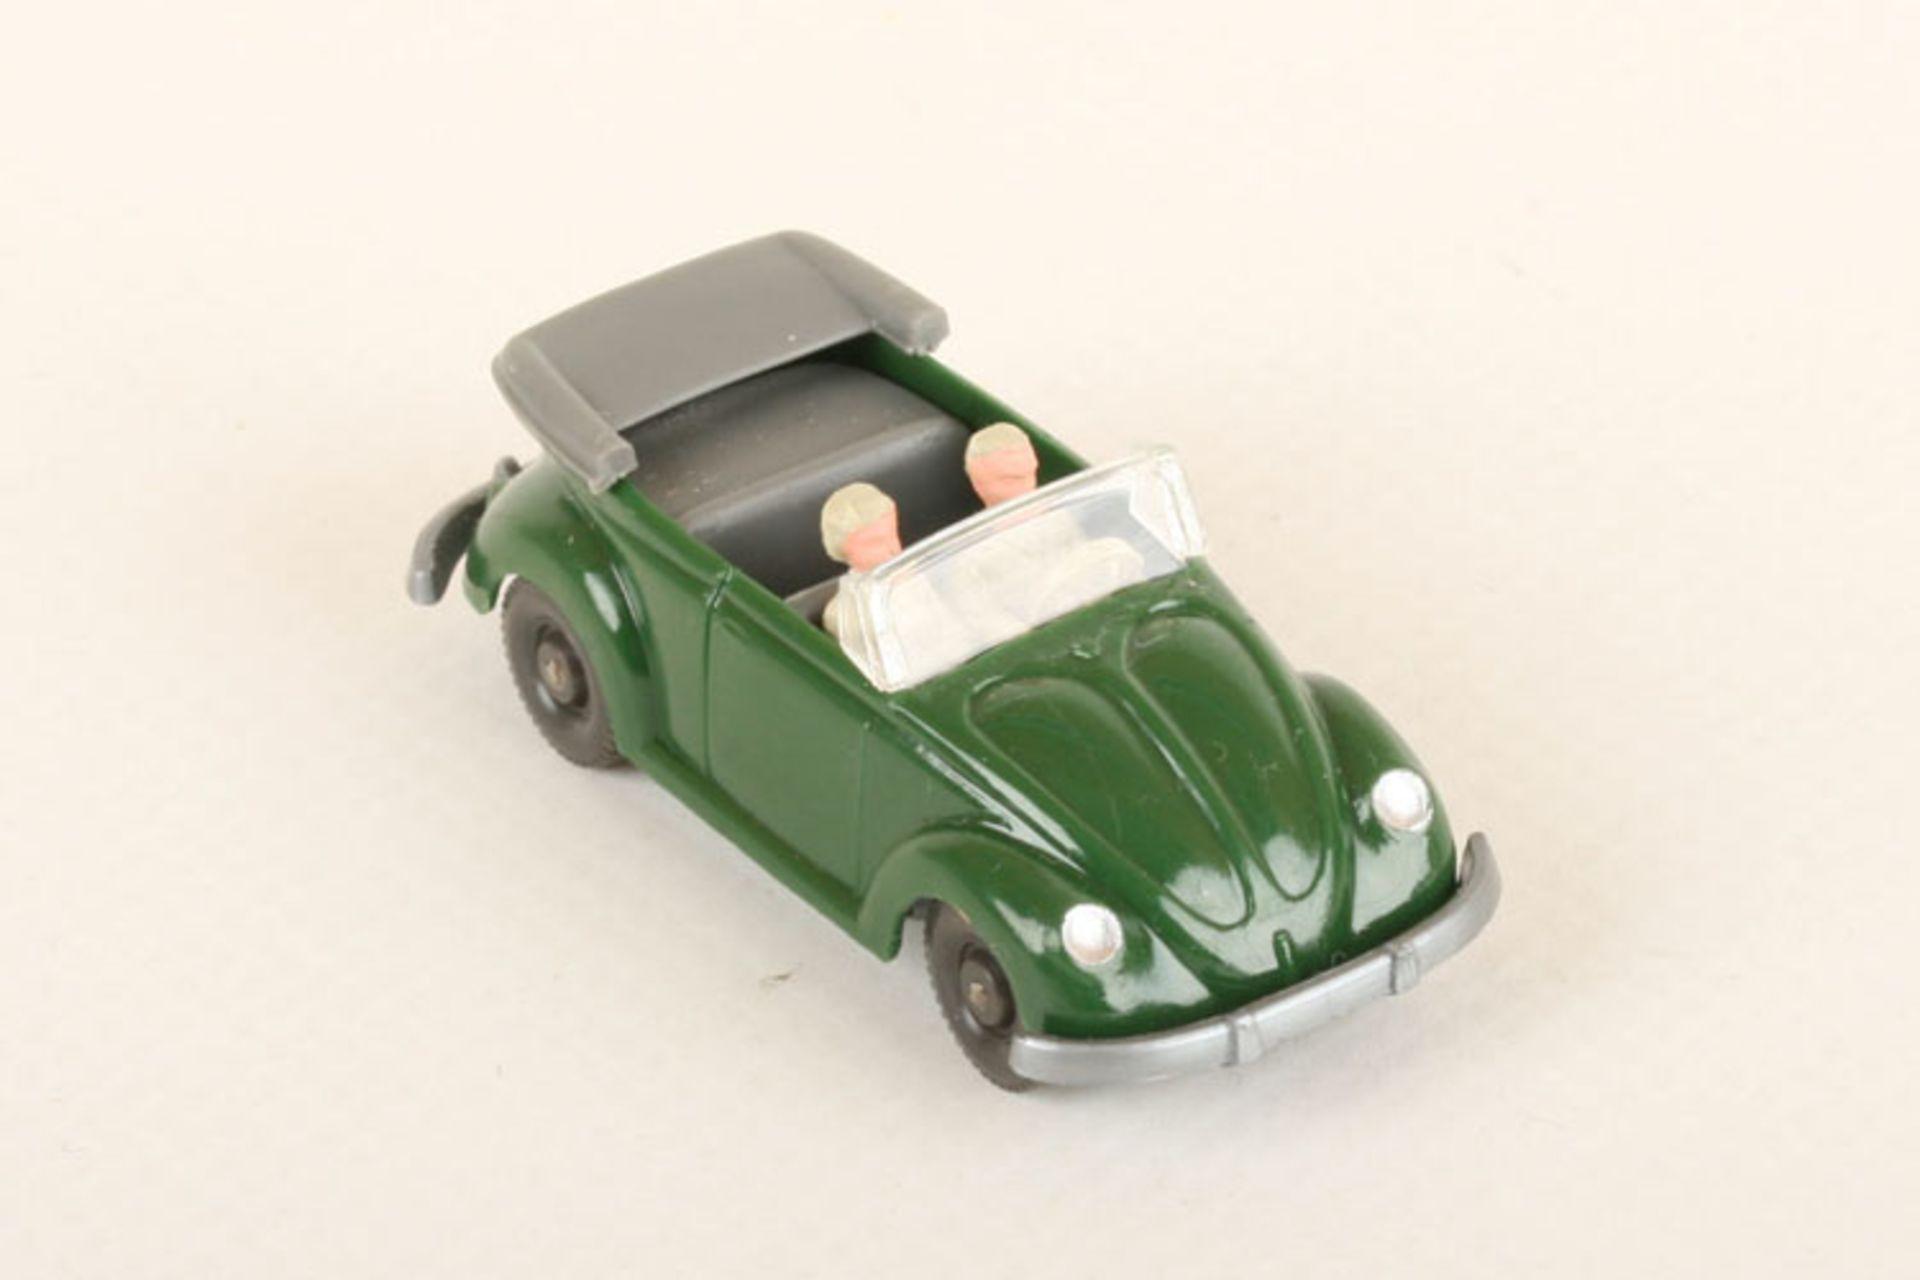 Los 1019 - Wiking VW Käfer Cabrio laubgrün 33/7r, IE staubgrau, neuwertig